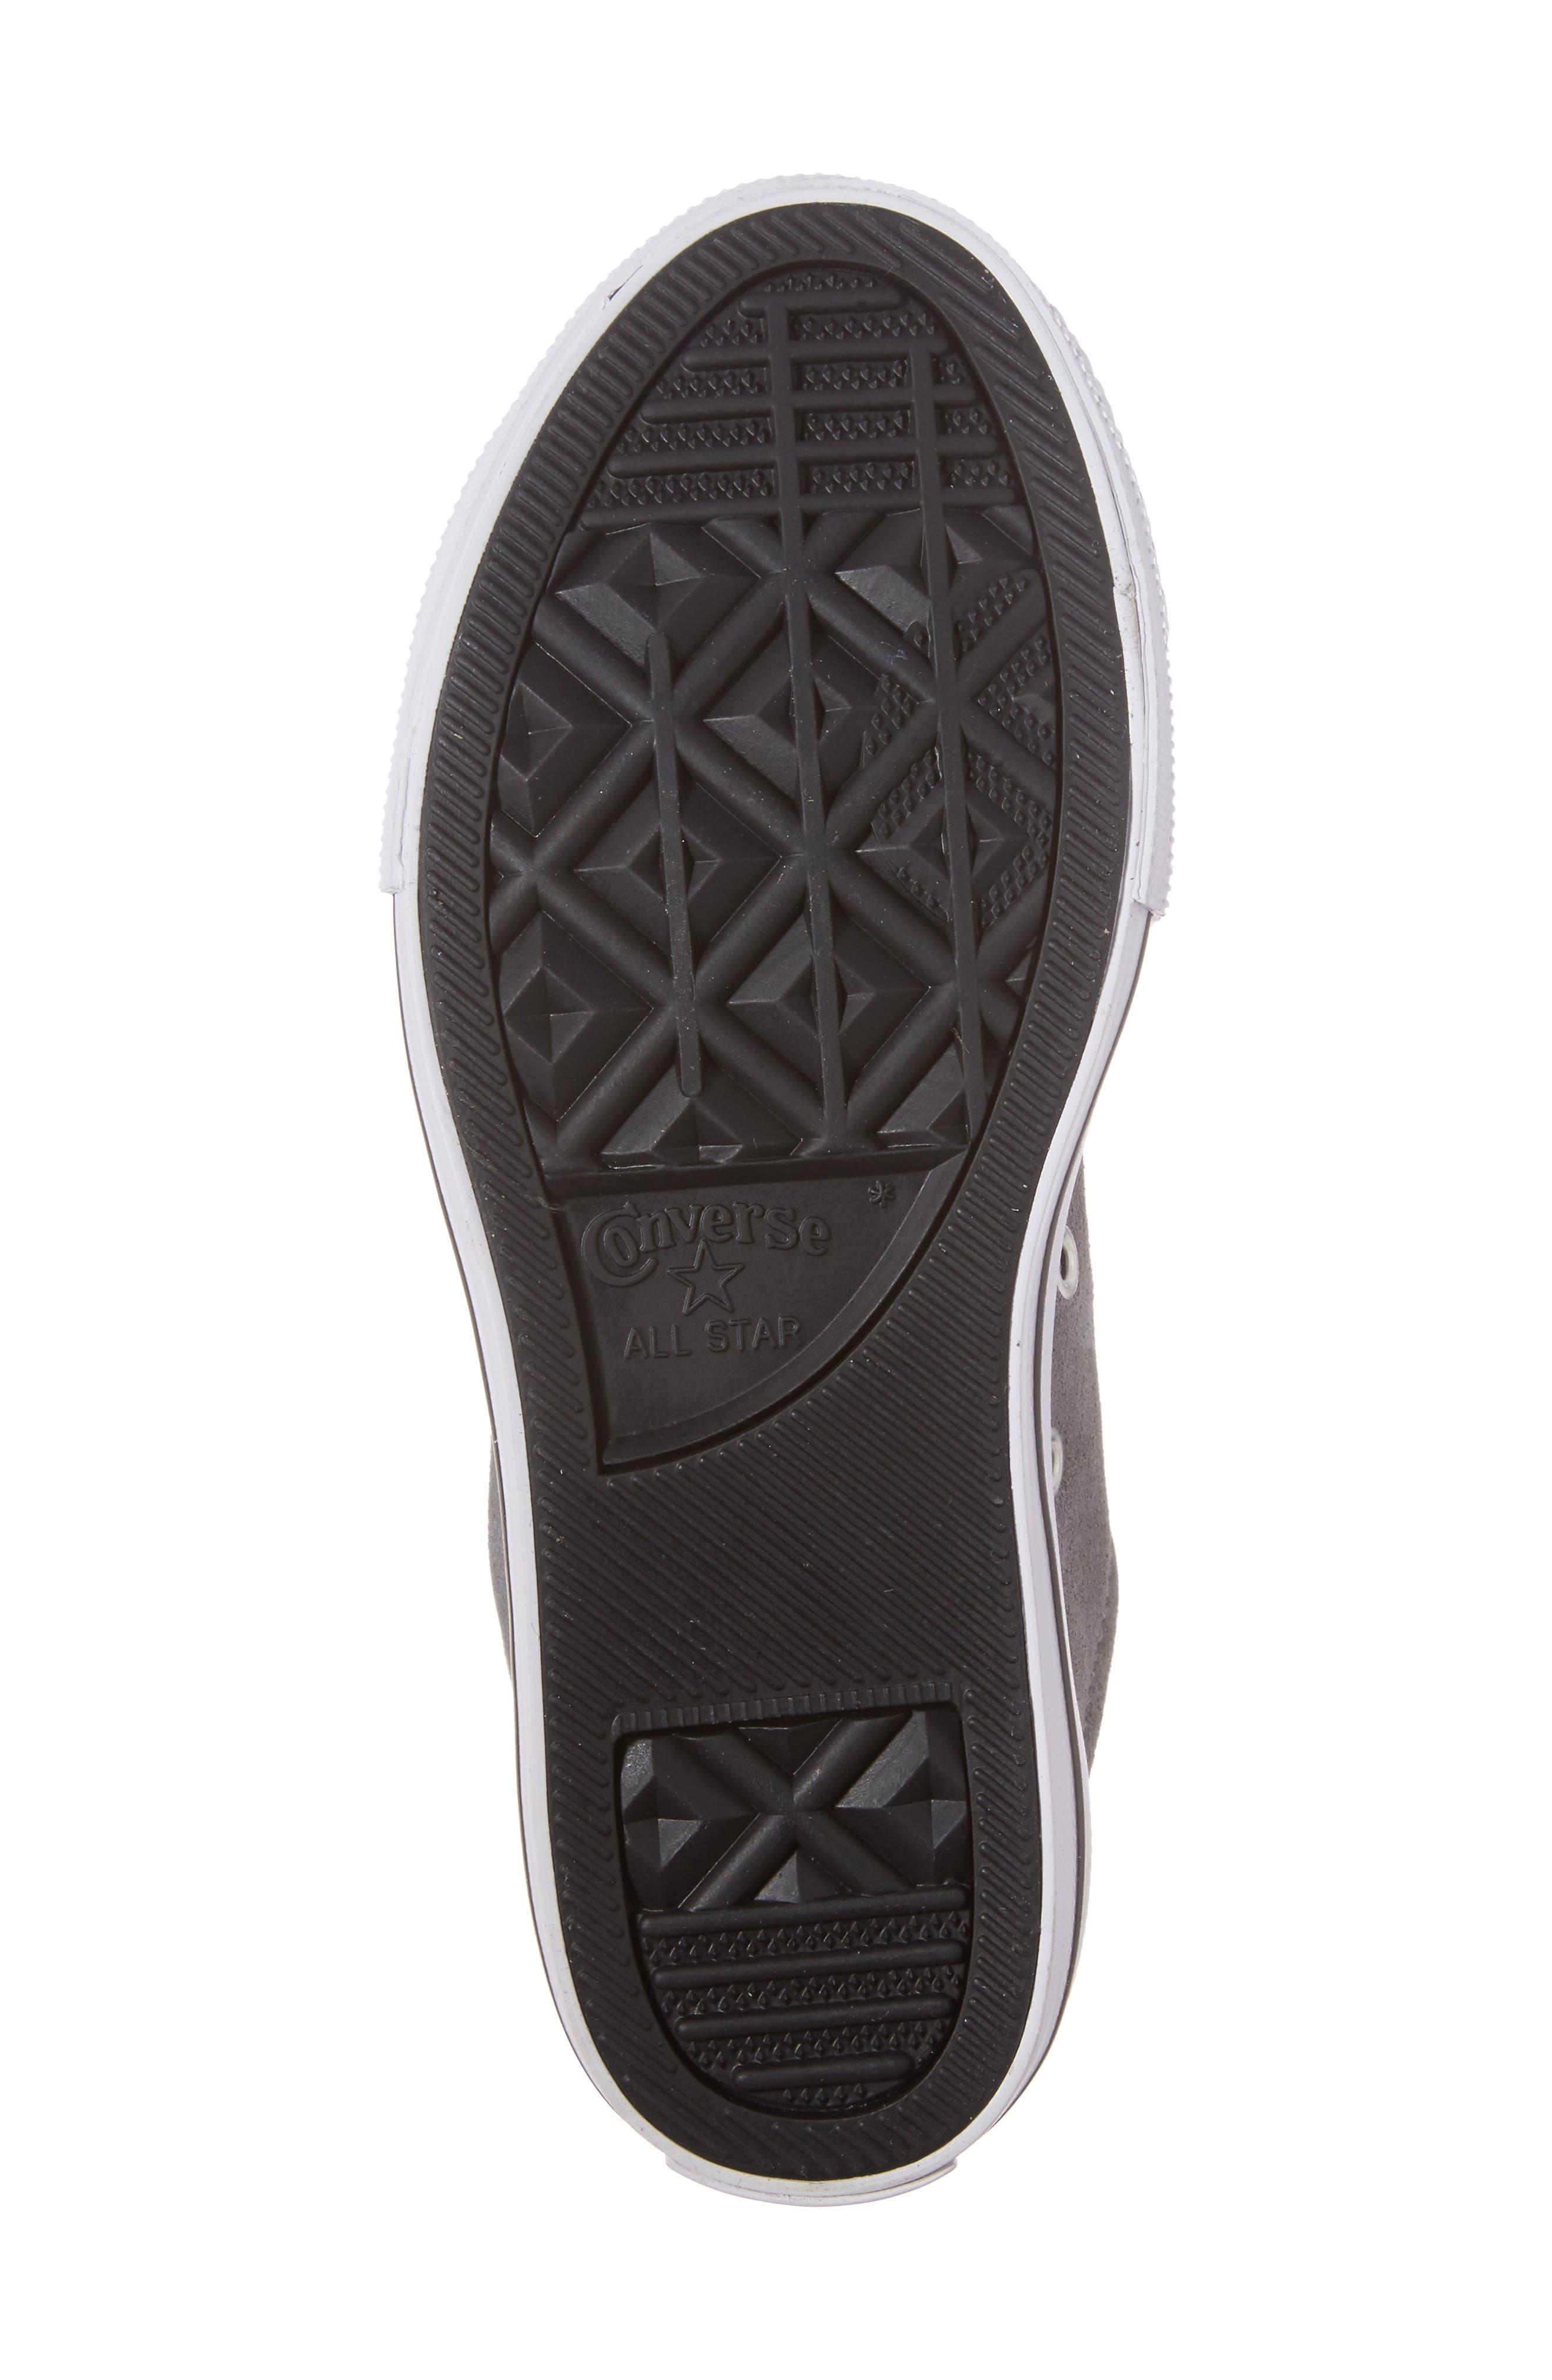 Chuck Taylor<sup>®</sup> All Star<sup>®</sup> Street Sneaker,                             Alternate thumbnail 6, color,                             Mason/ Black/ White